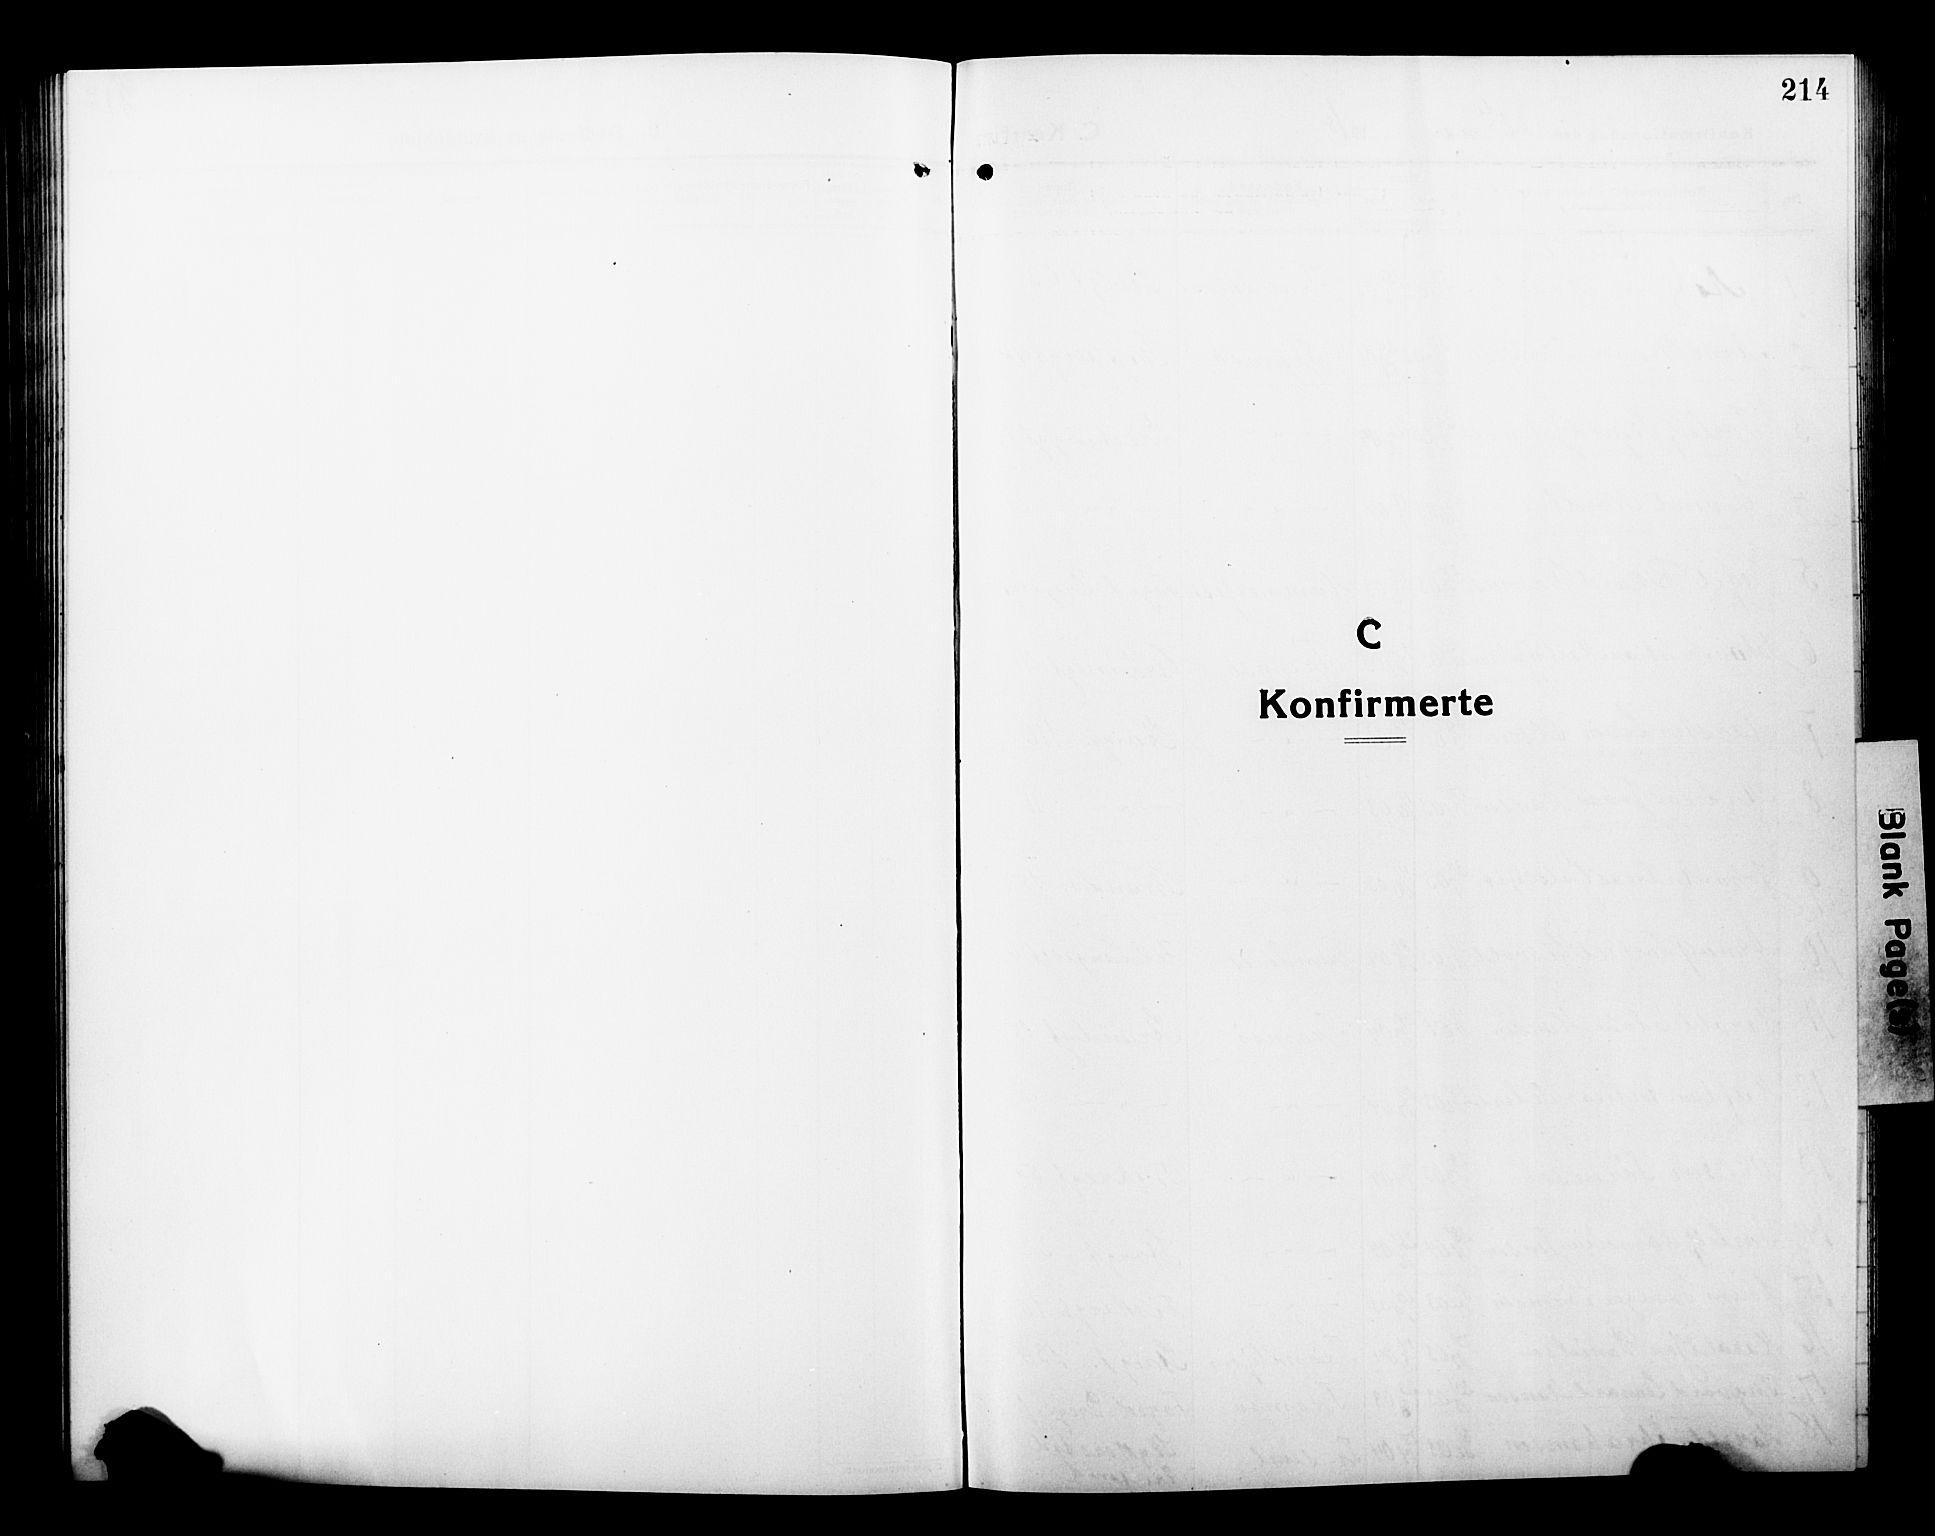 SATØ, Tromsø sokneprestkontor/stiftsprosti/domprosti, G/Gb/L0009klokker: Klokkerbok nr. 9, 1915-1925, s. 214